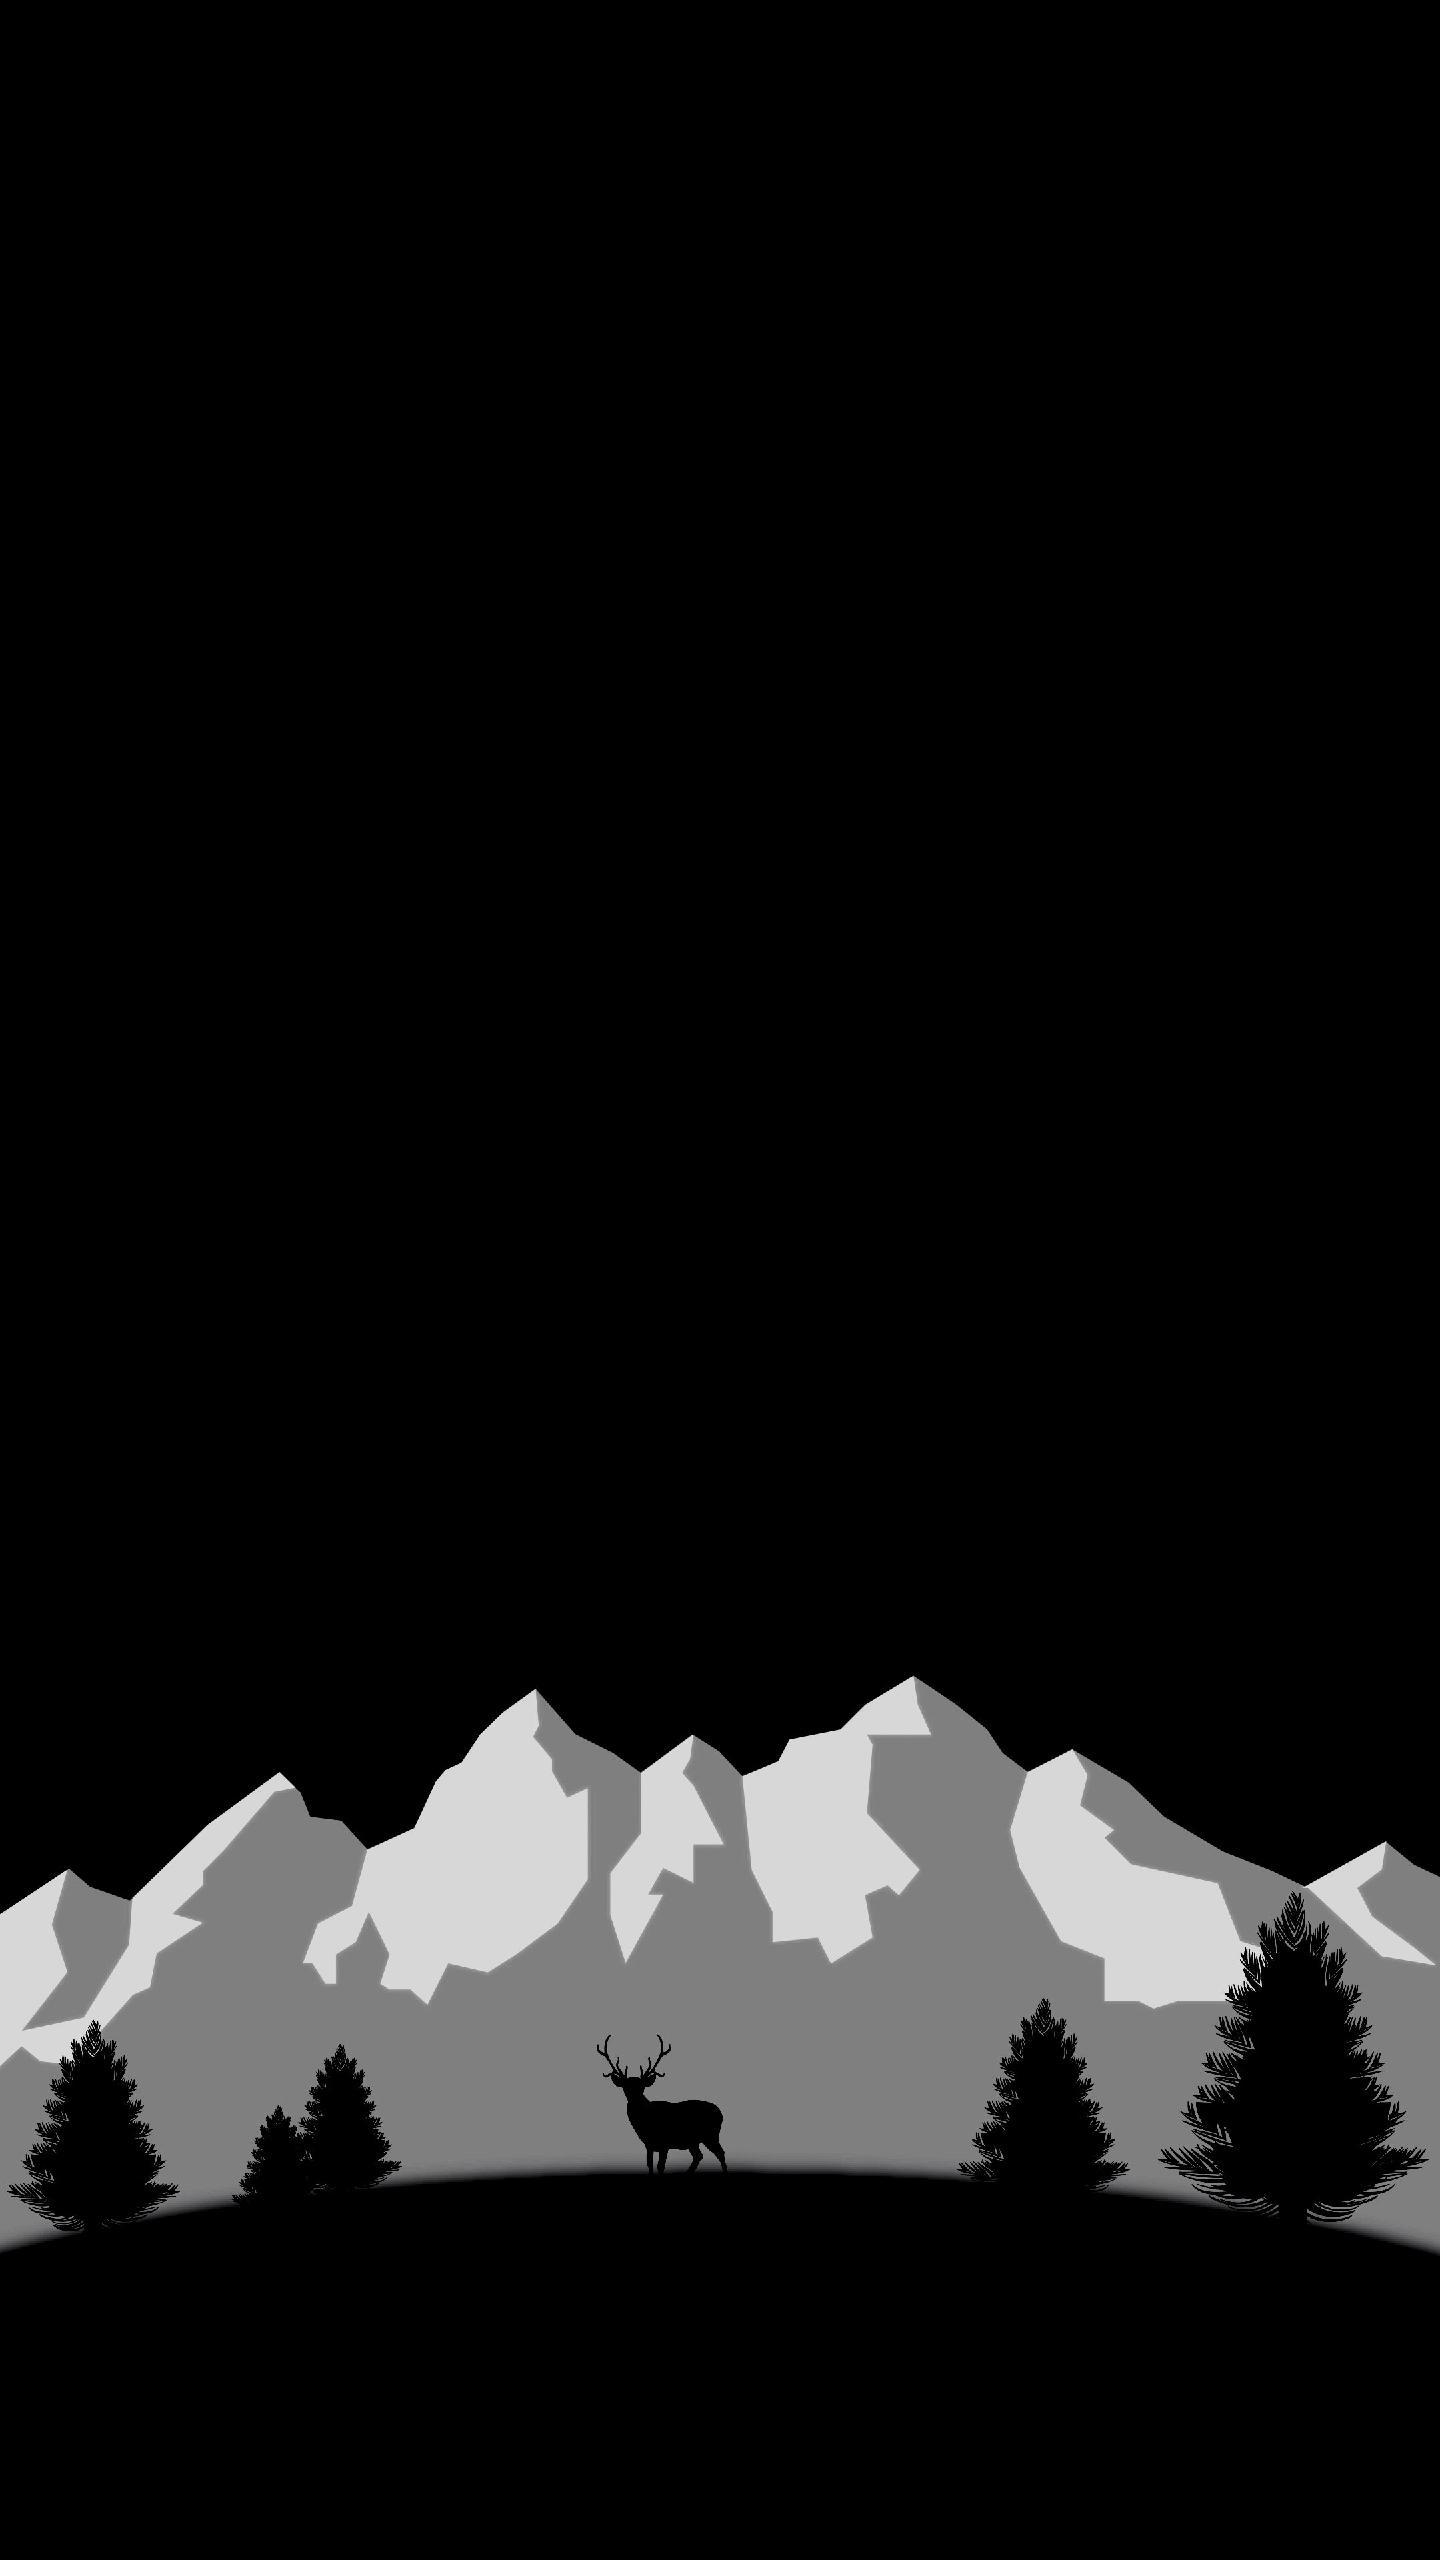 Black Night Minimal Background Hd Wallpaper